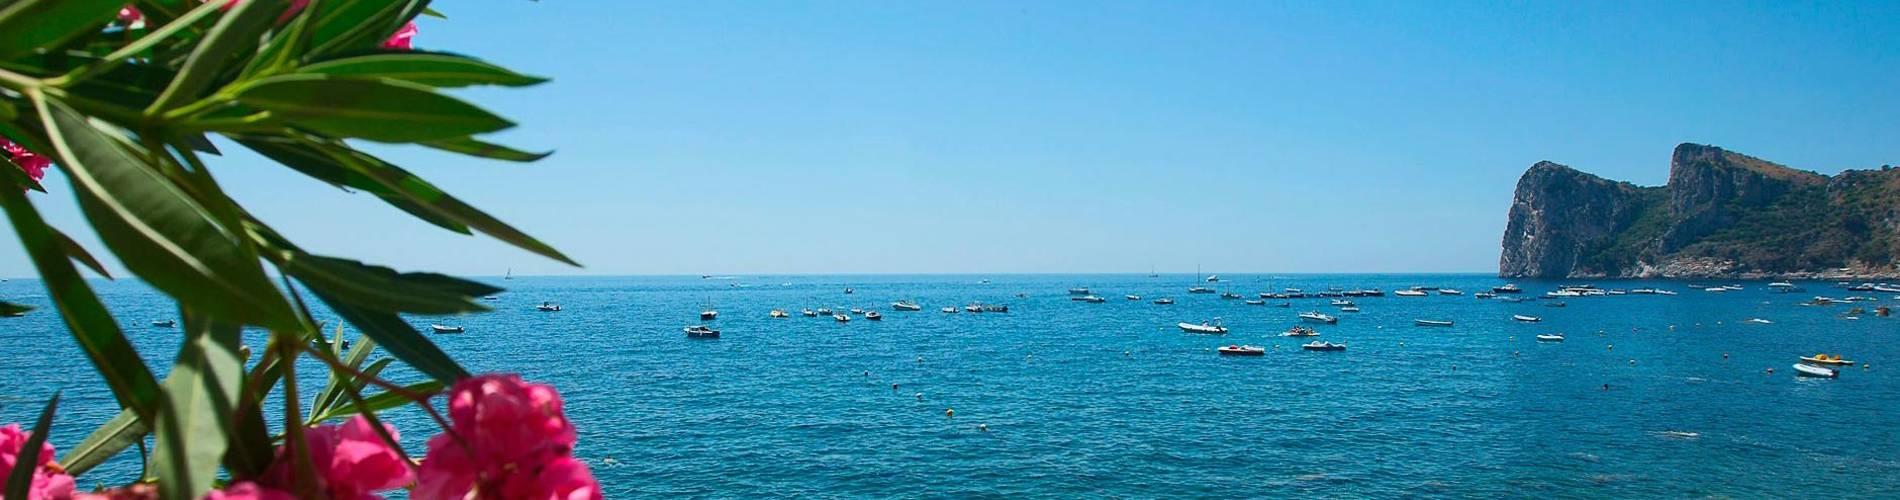 Relais Blu, Sorrento, Italy (2).jpg